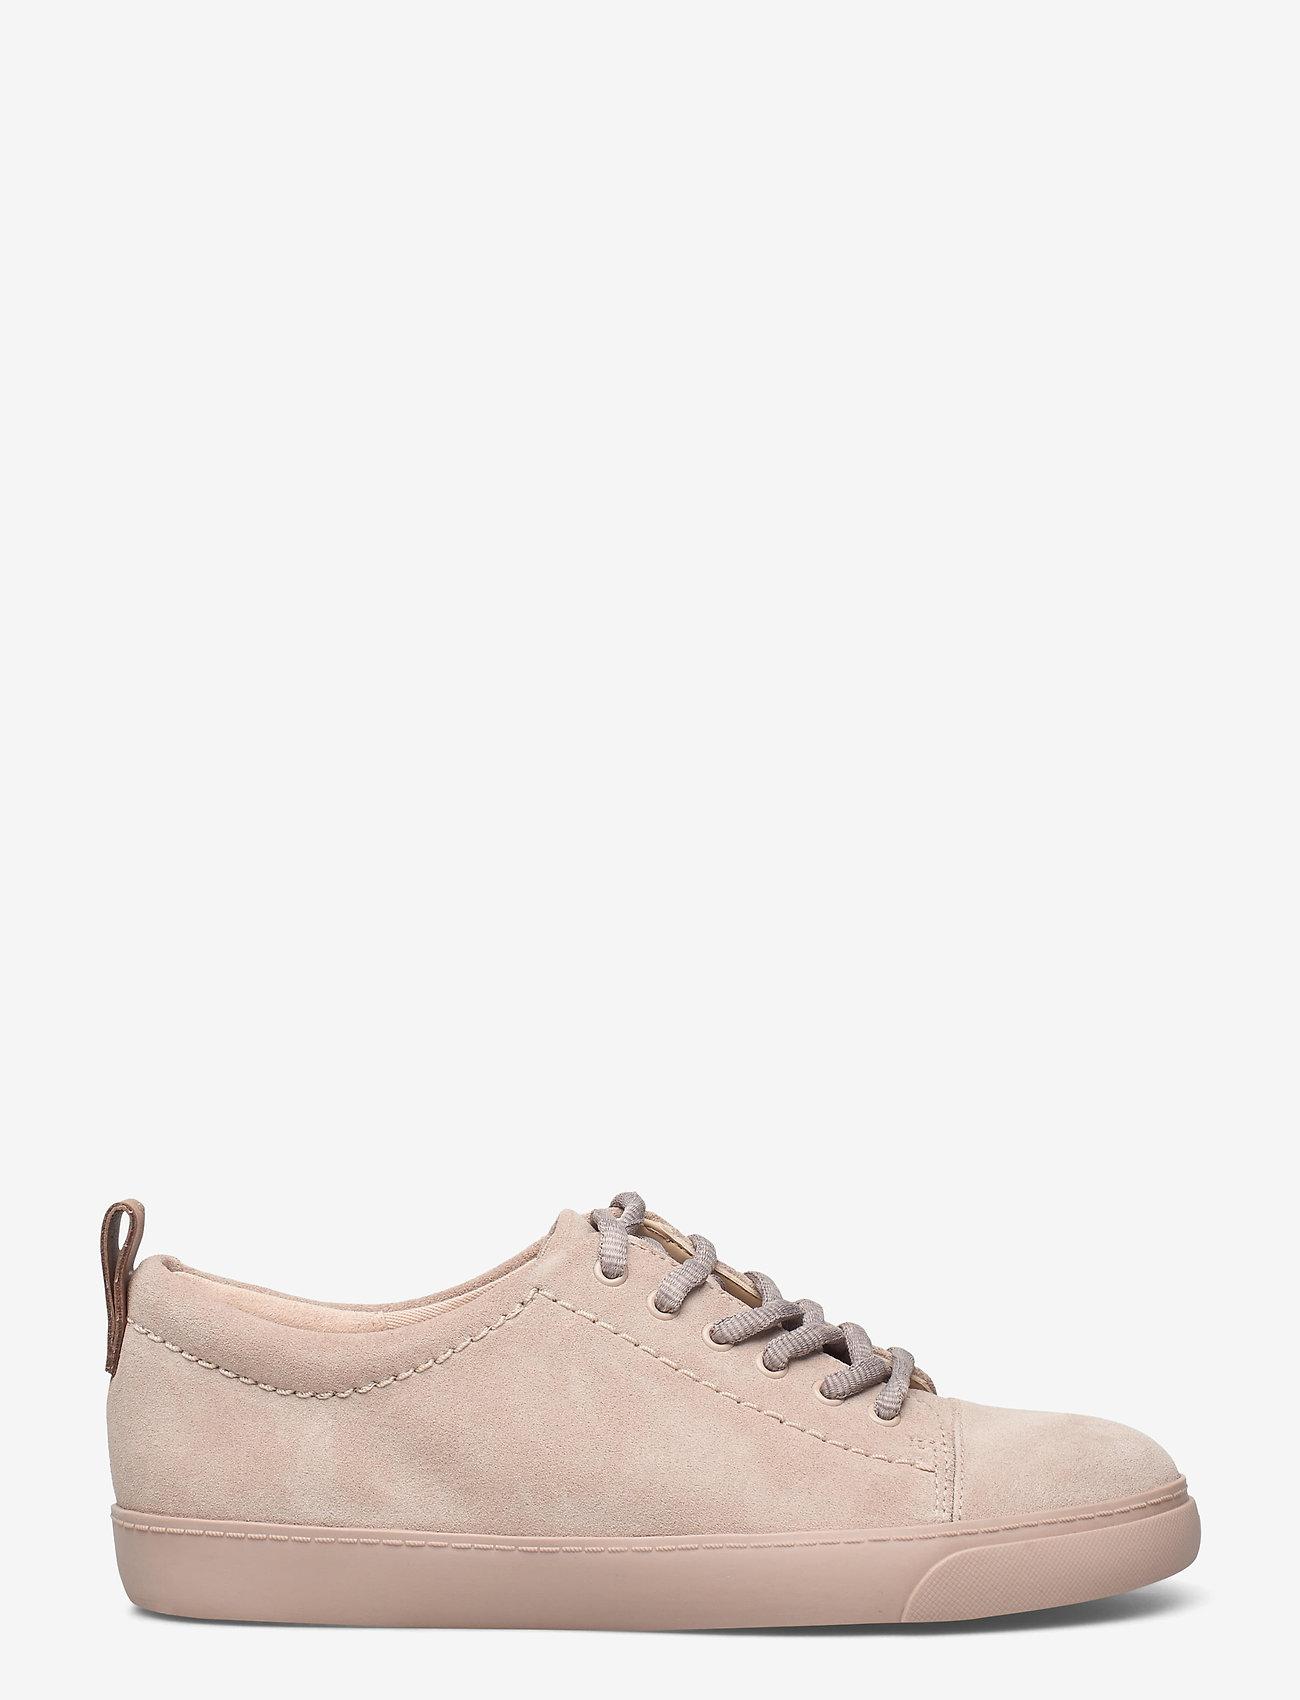 Clarks - Glove Echo - lage sneakers - nude pink - 1